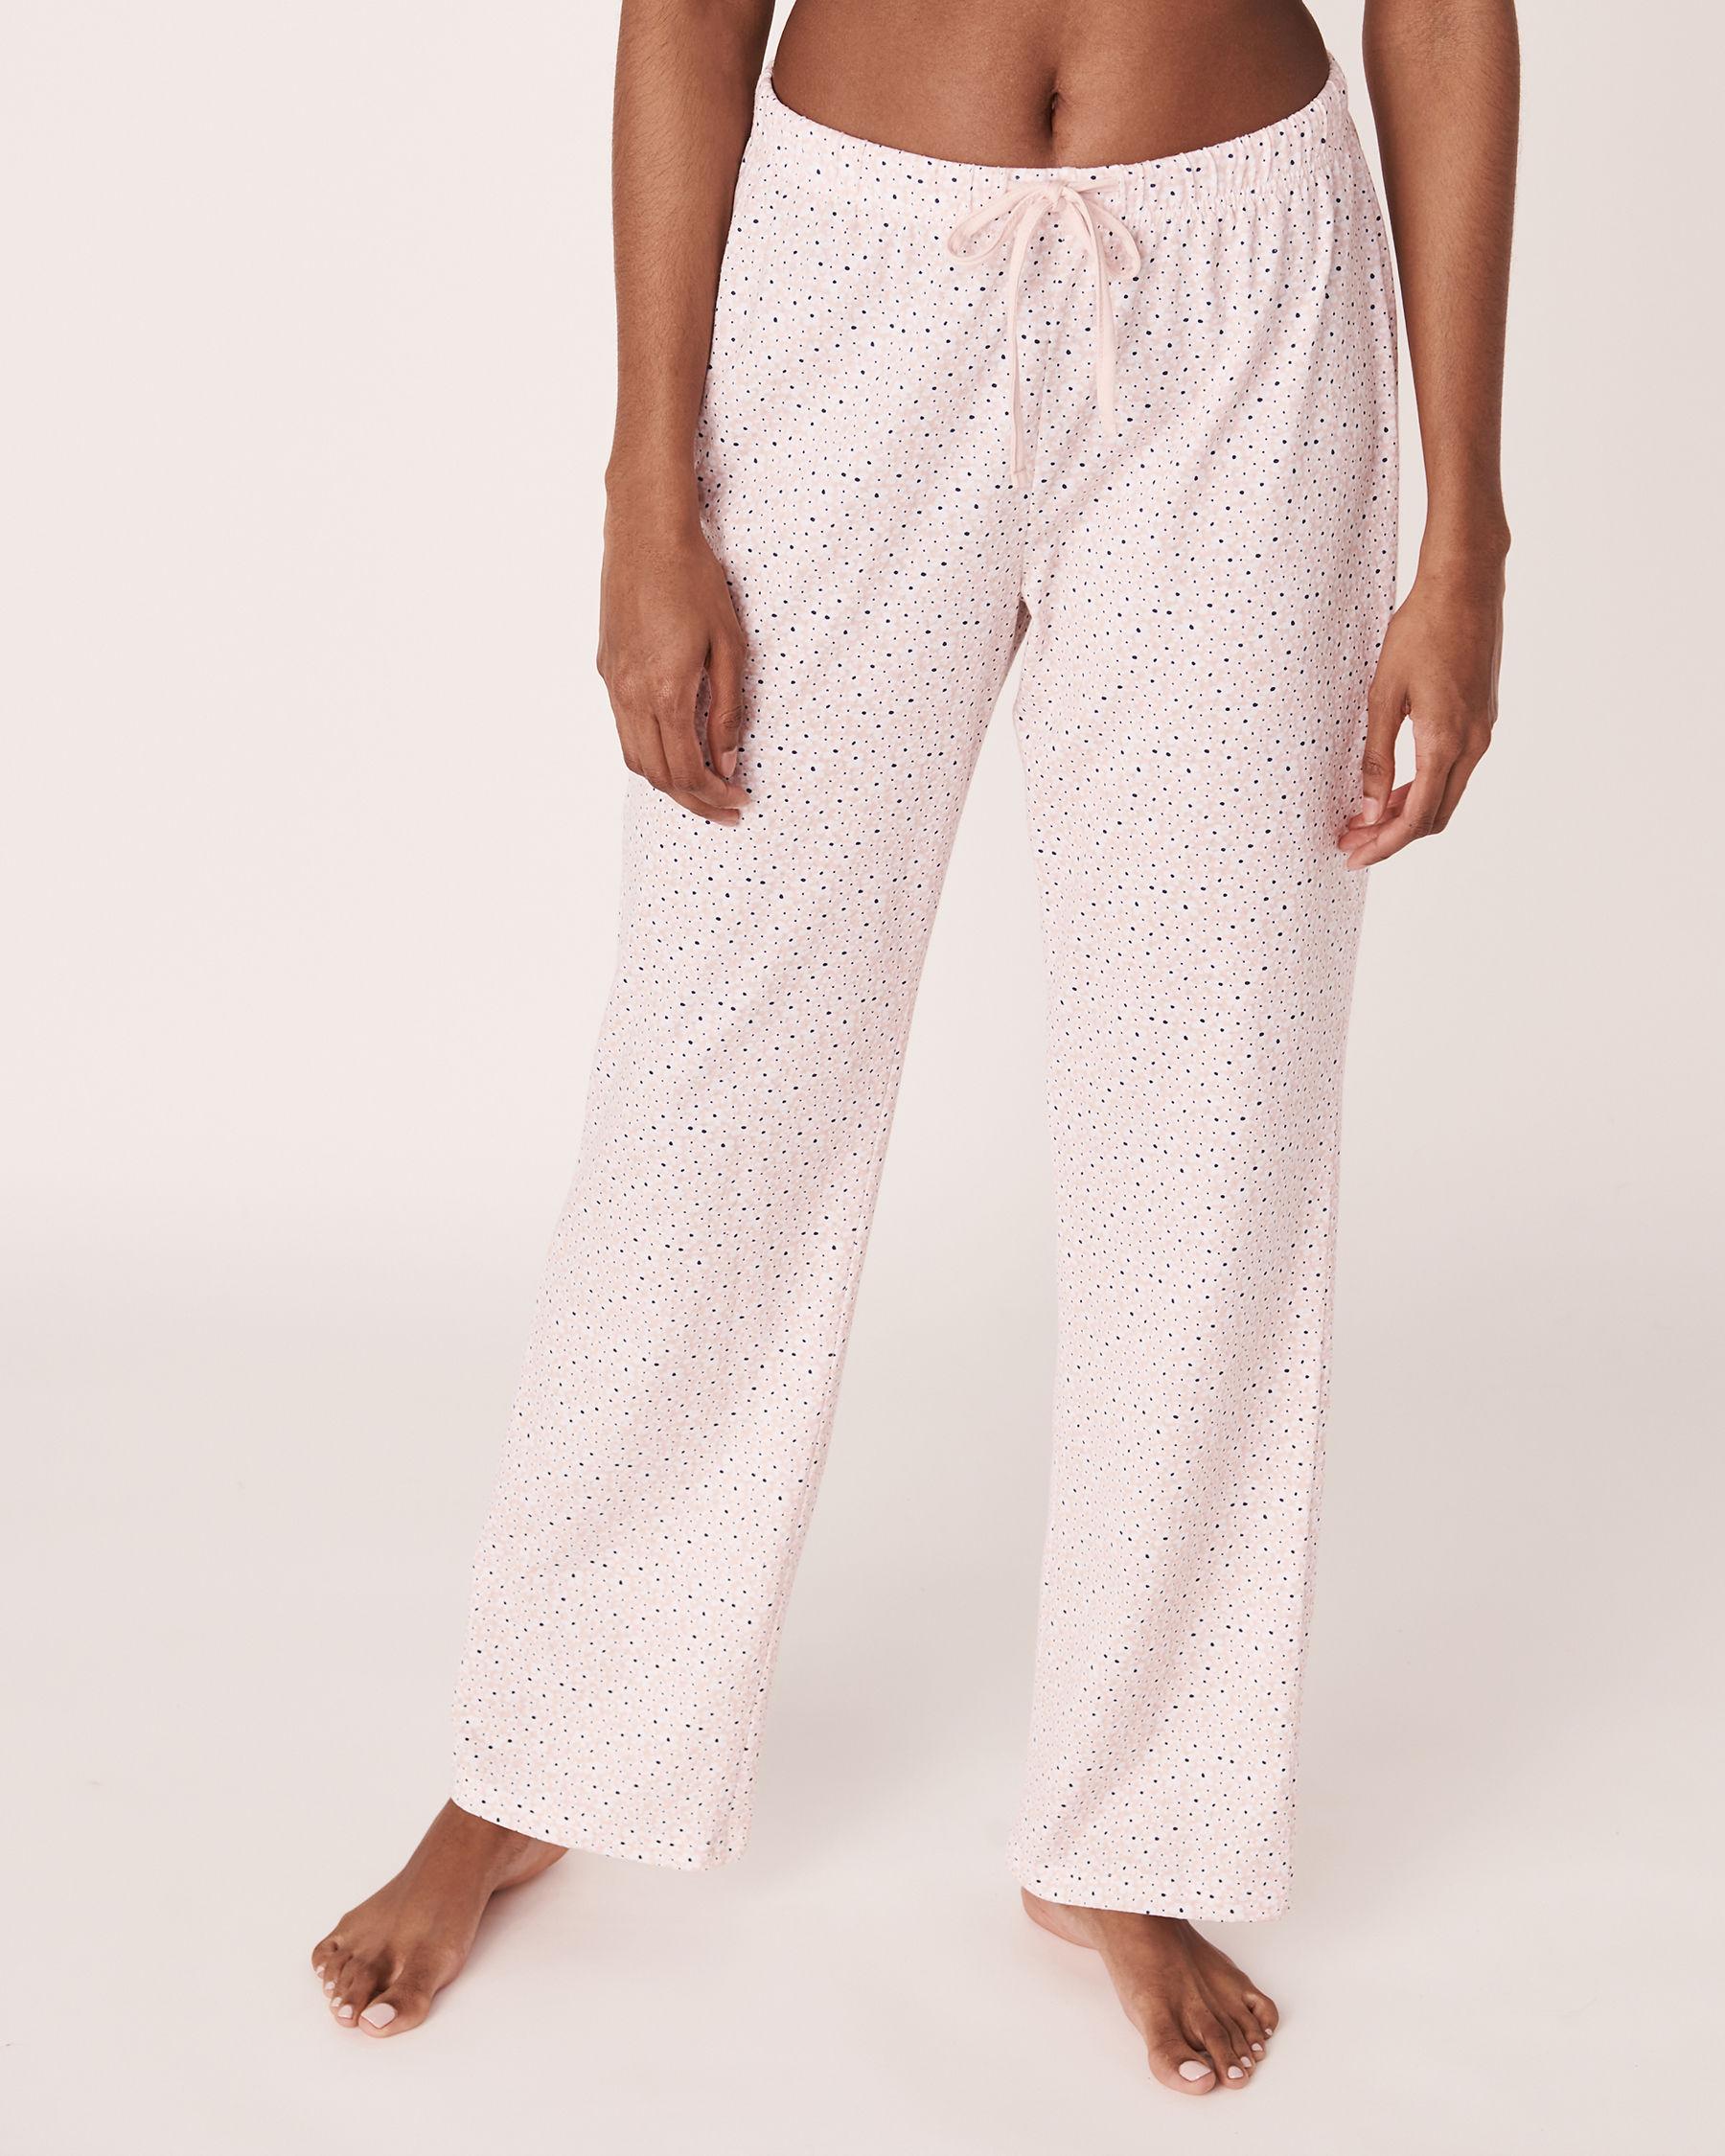 LA VIE EN ROSE Straight Leg Pyjama Pant Flowers 40200110 - View3